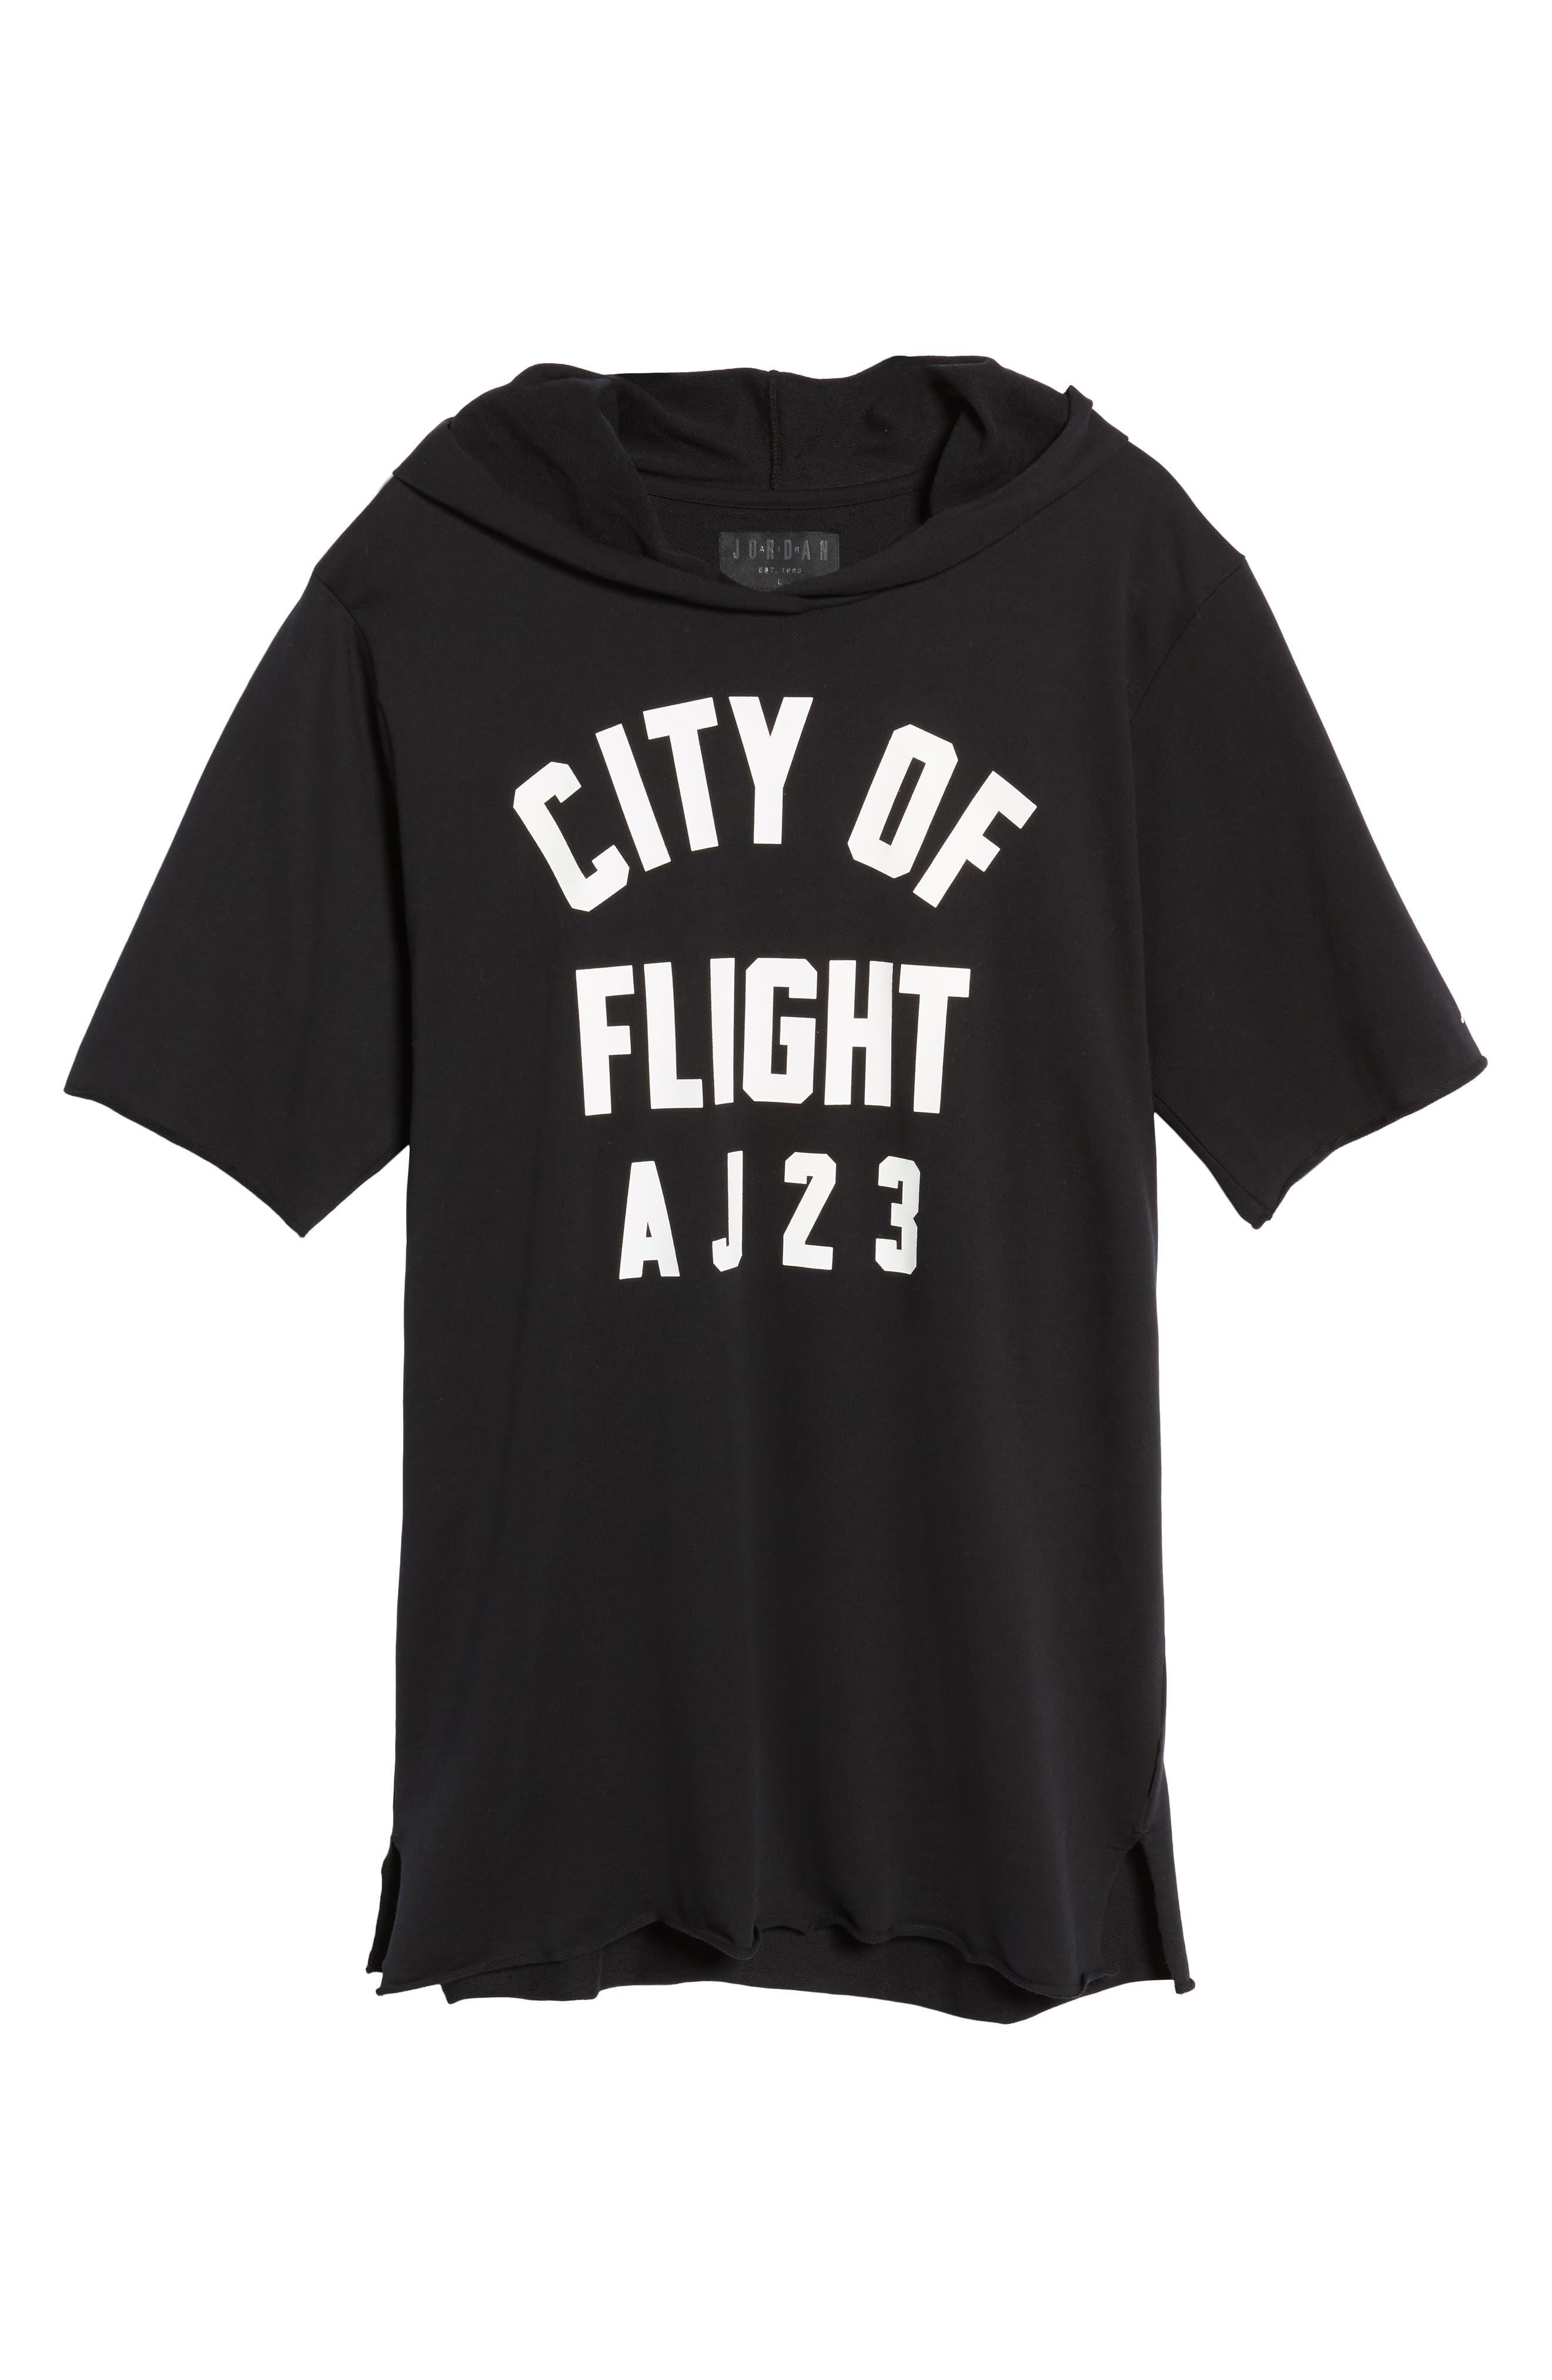 Sportswear City of Flight Hooded T-Shirt,                             Alternate thumbnail 6, color,                             Black/ White